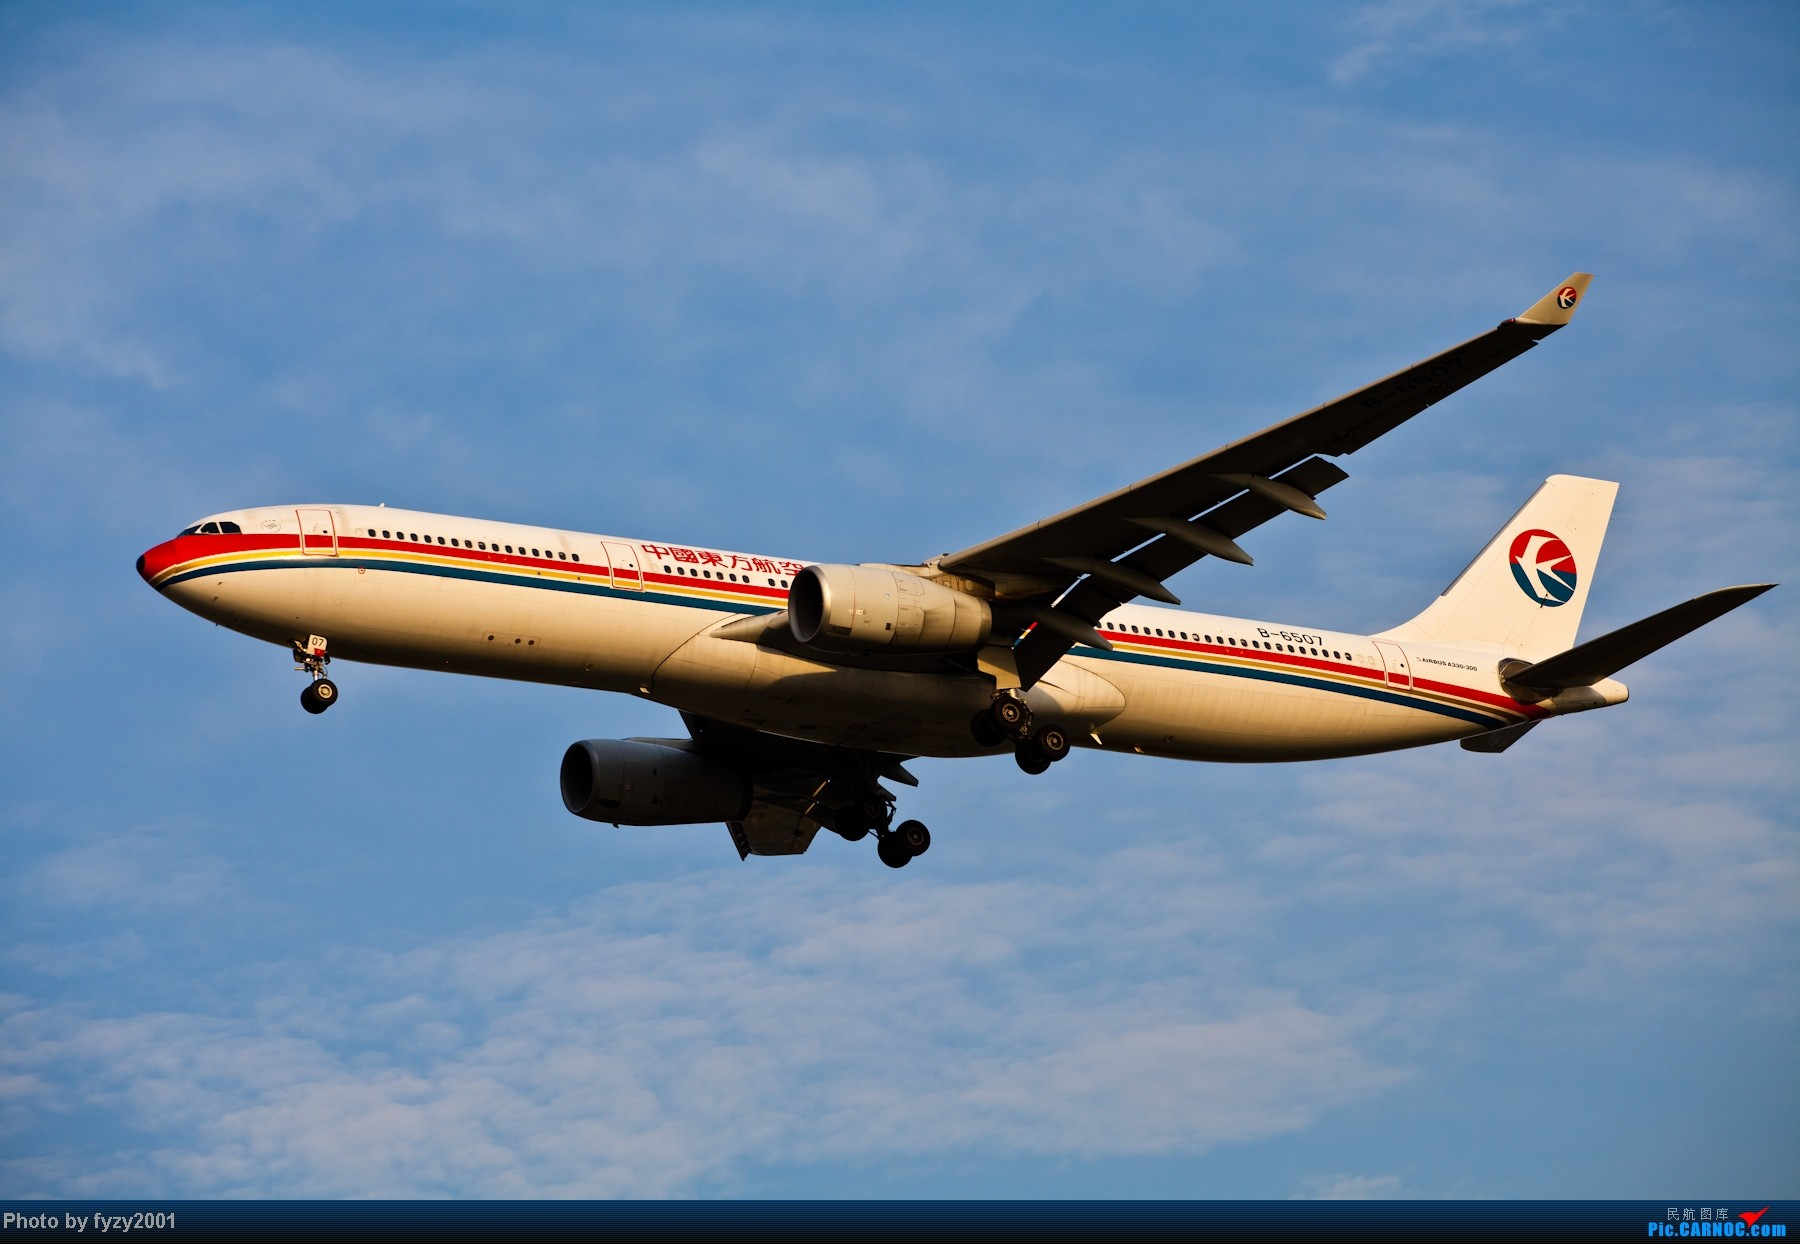 Re:[原创][无锡西站]长假PVG蹲守~~~~只发大图,多图杀猫~~~~ AIRBUS A330-300 B-6507 中国上海浦东机场